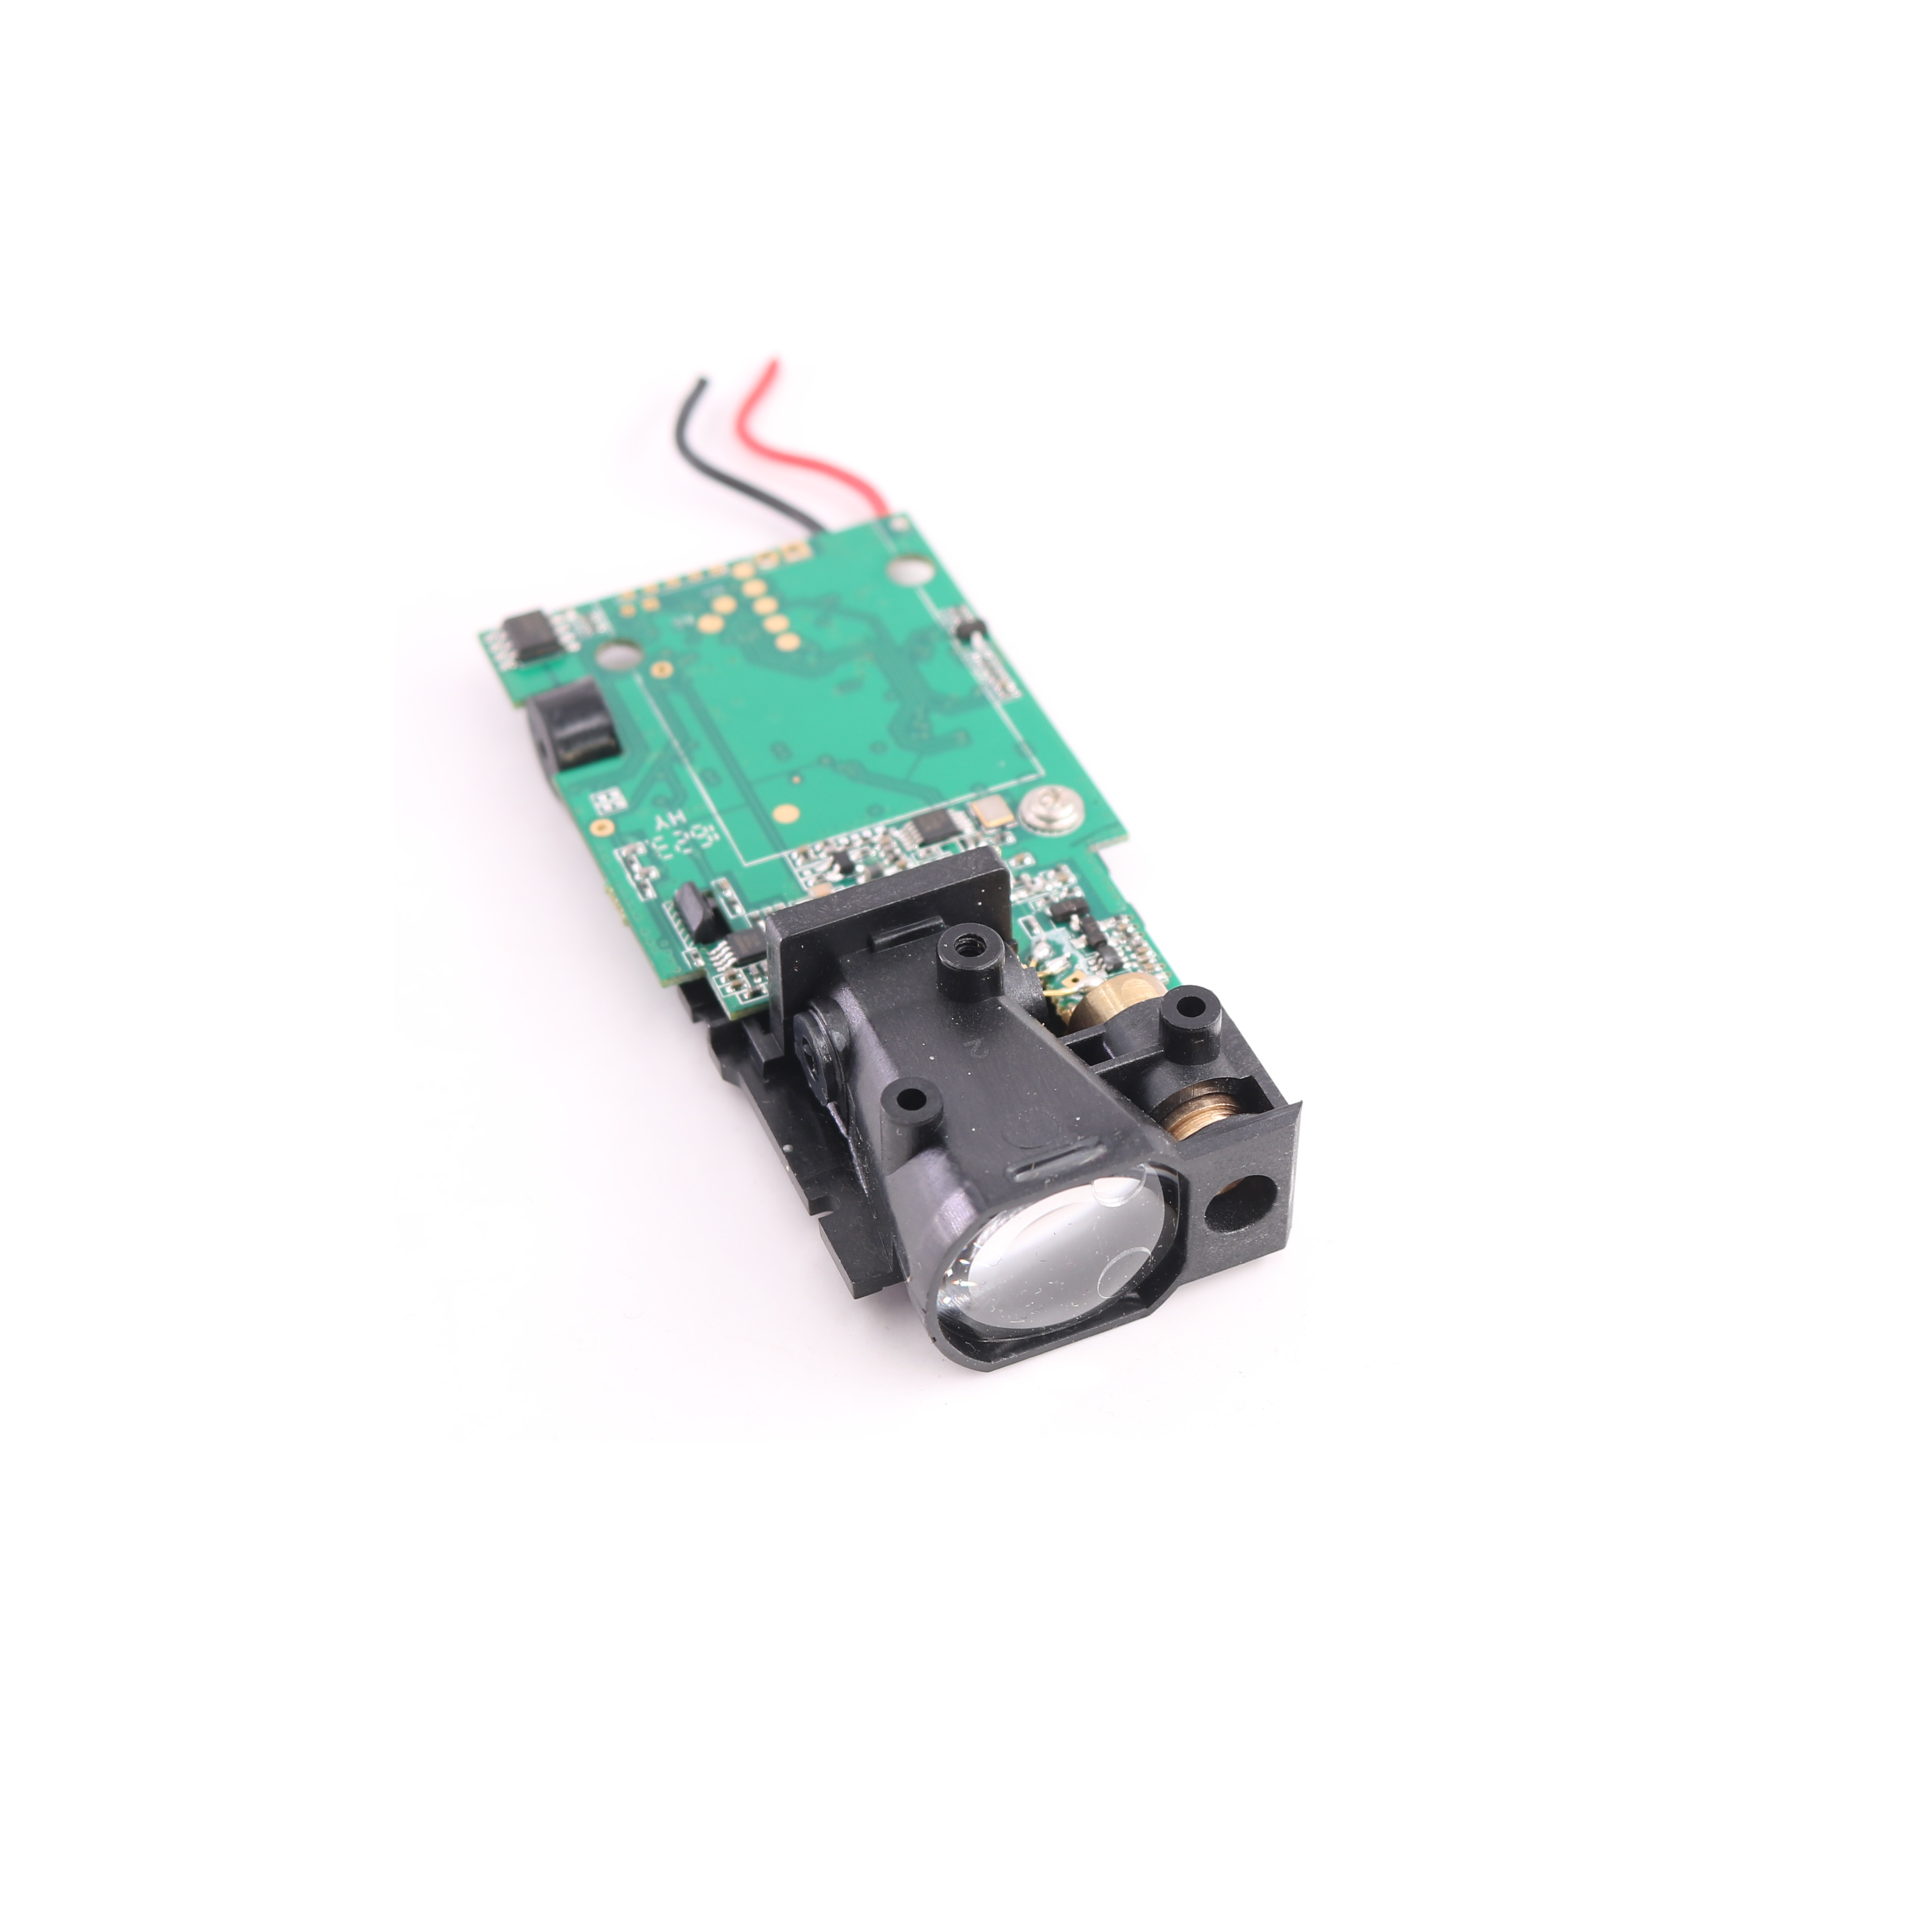 40m 1Hz Low Speed Laser Ranging Module Distance Measurement Module